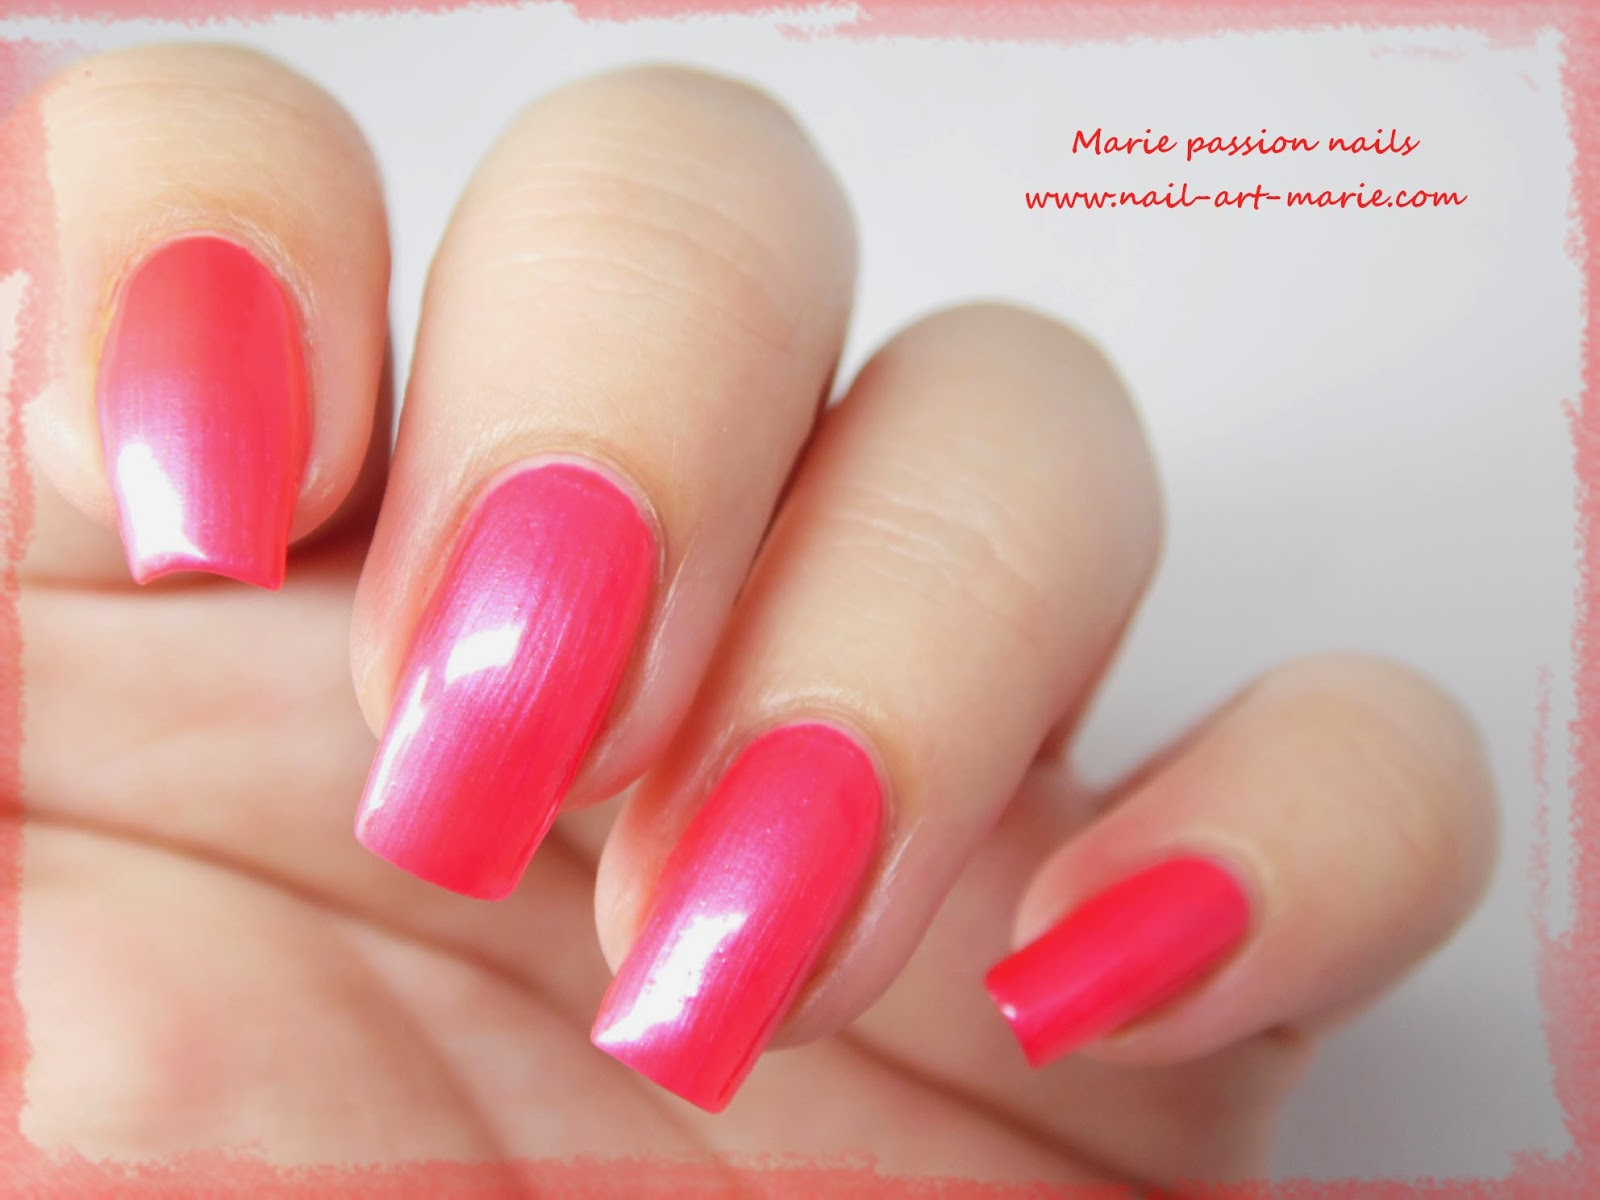 LM Cosmetic Fonte Nova8